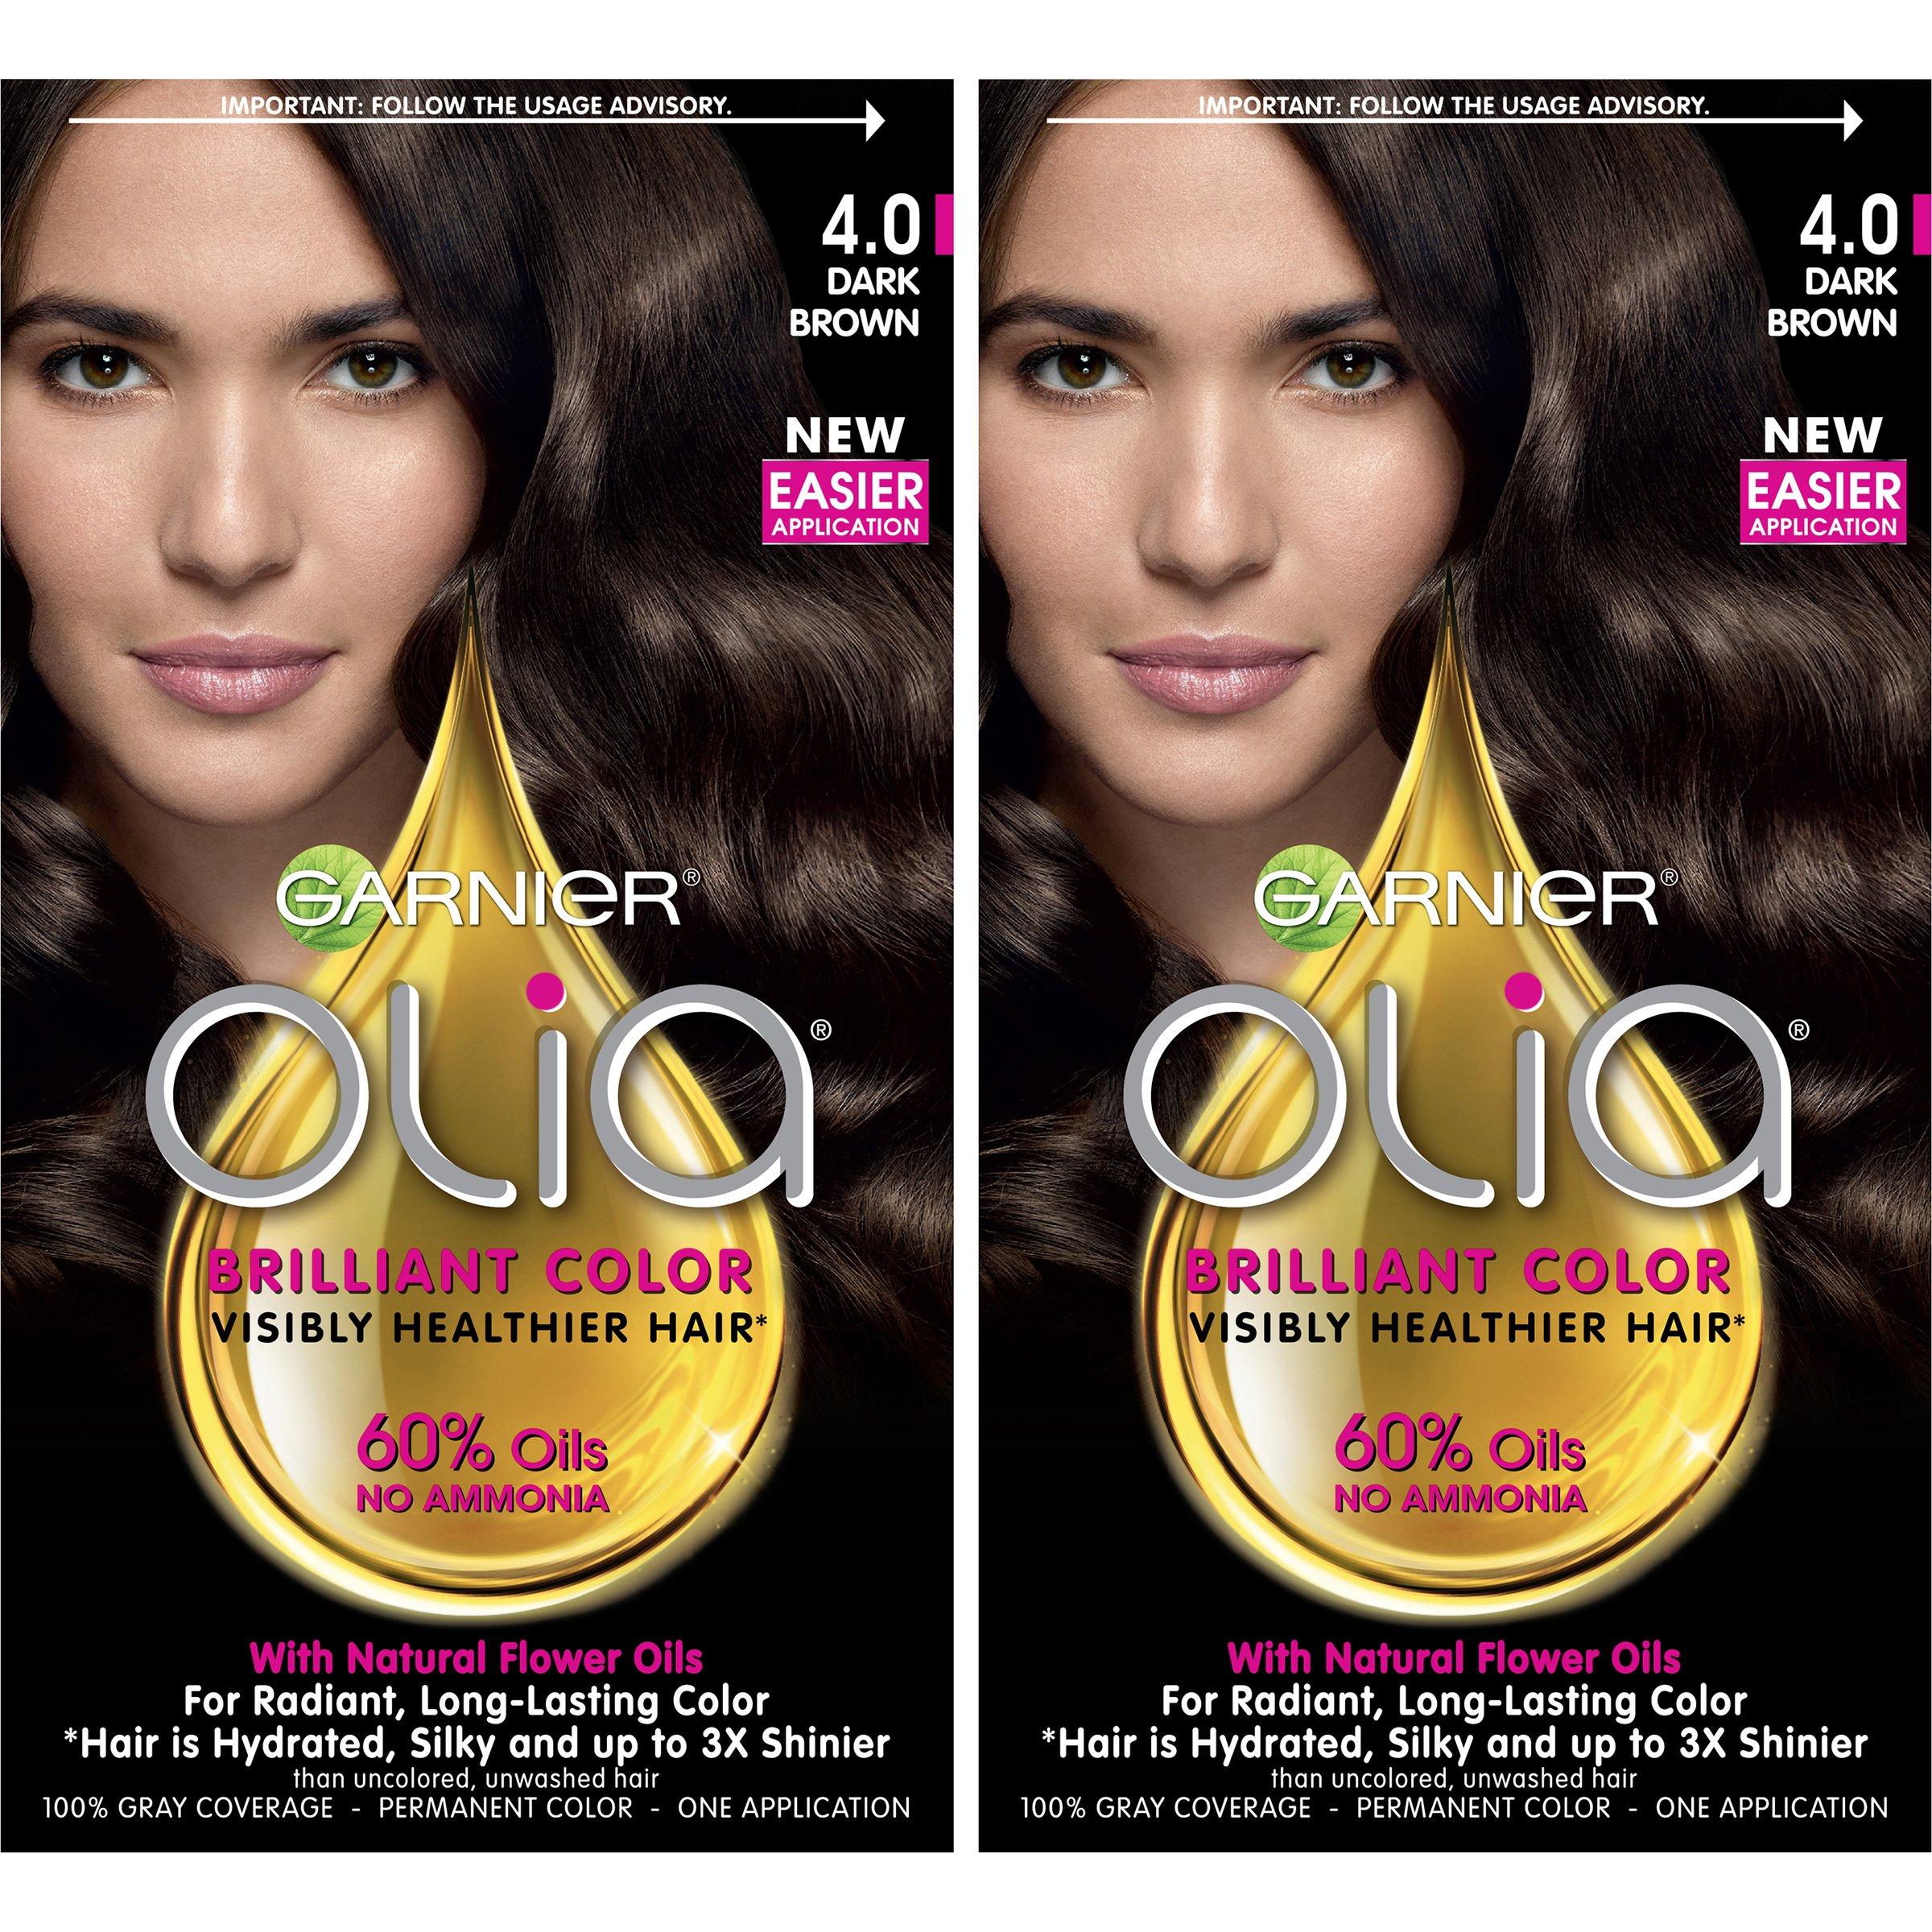 Garnier Hair Color Olia Oil Powered Permanent, 4.0 Dark Brown, 2 Count